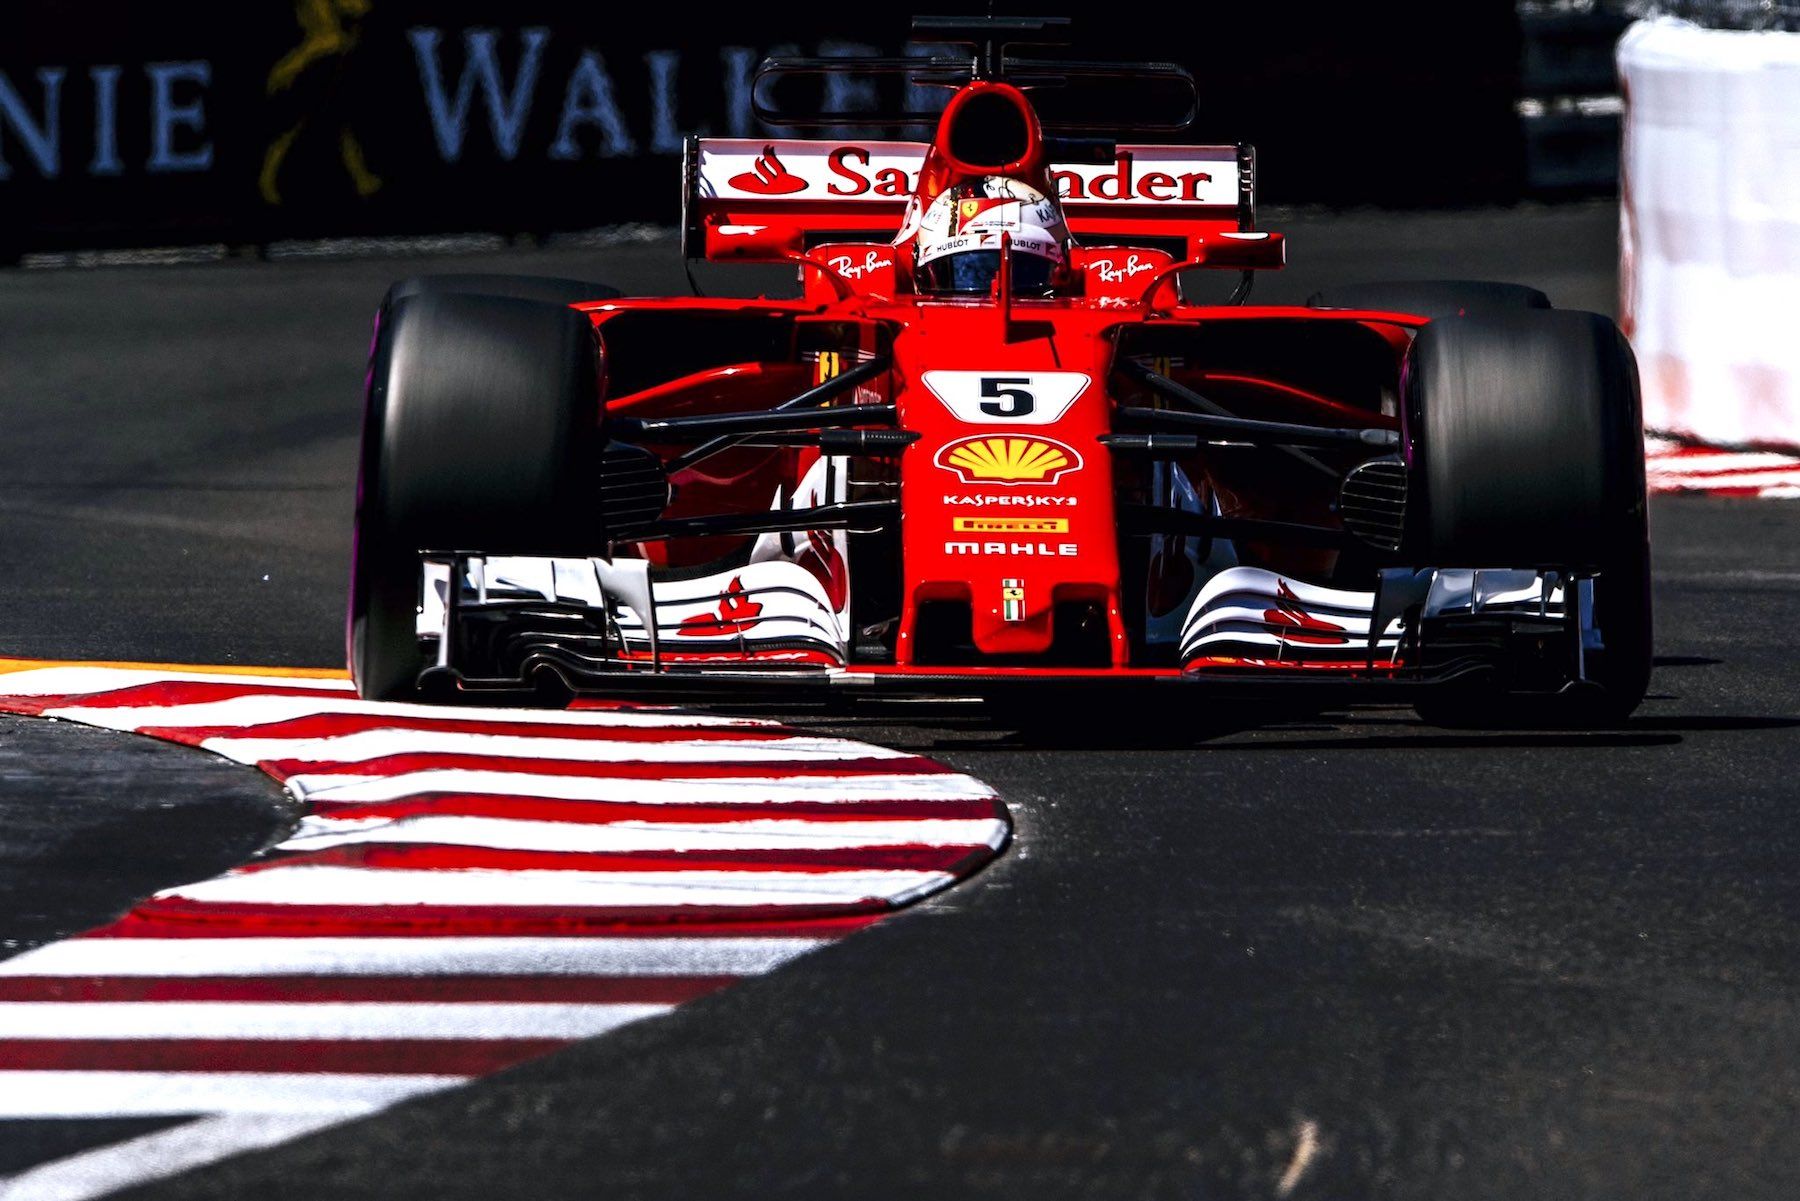 R 2017 Sebastian Vettel | Ferrari SF70H | 2017 Monaco GP winner 2 copy.jpg